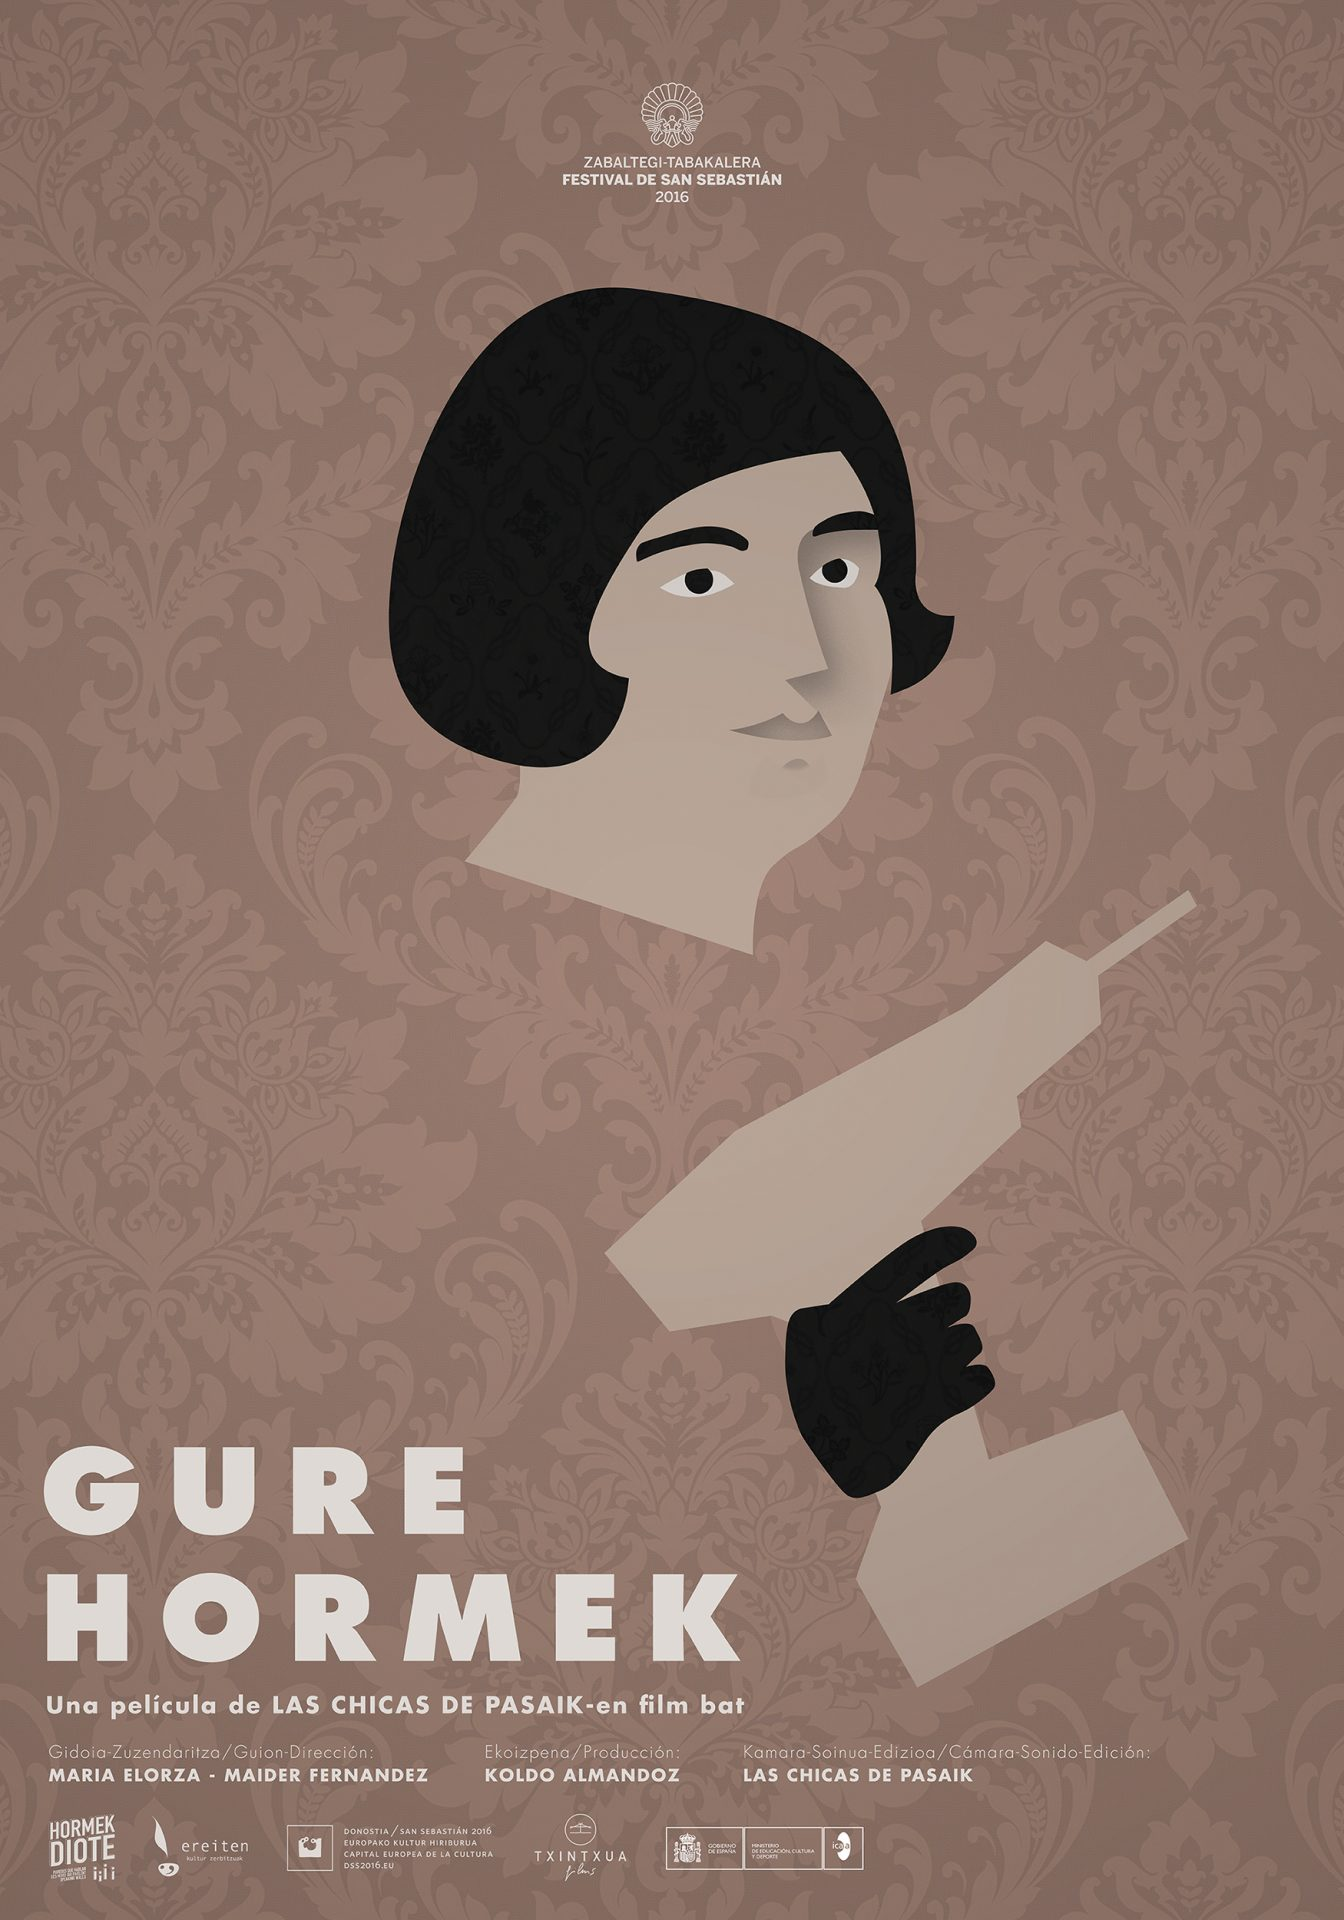 GURE HORMEK – LAS CHICAS DE PASAIK